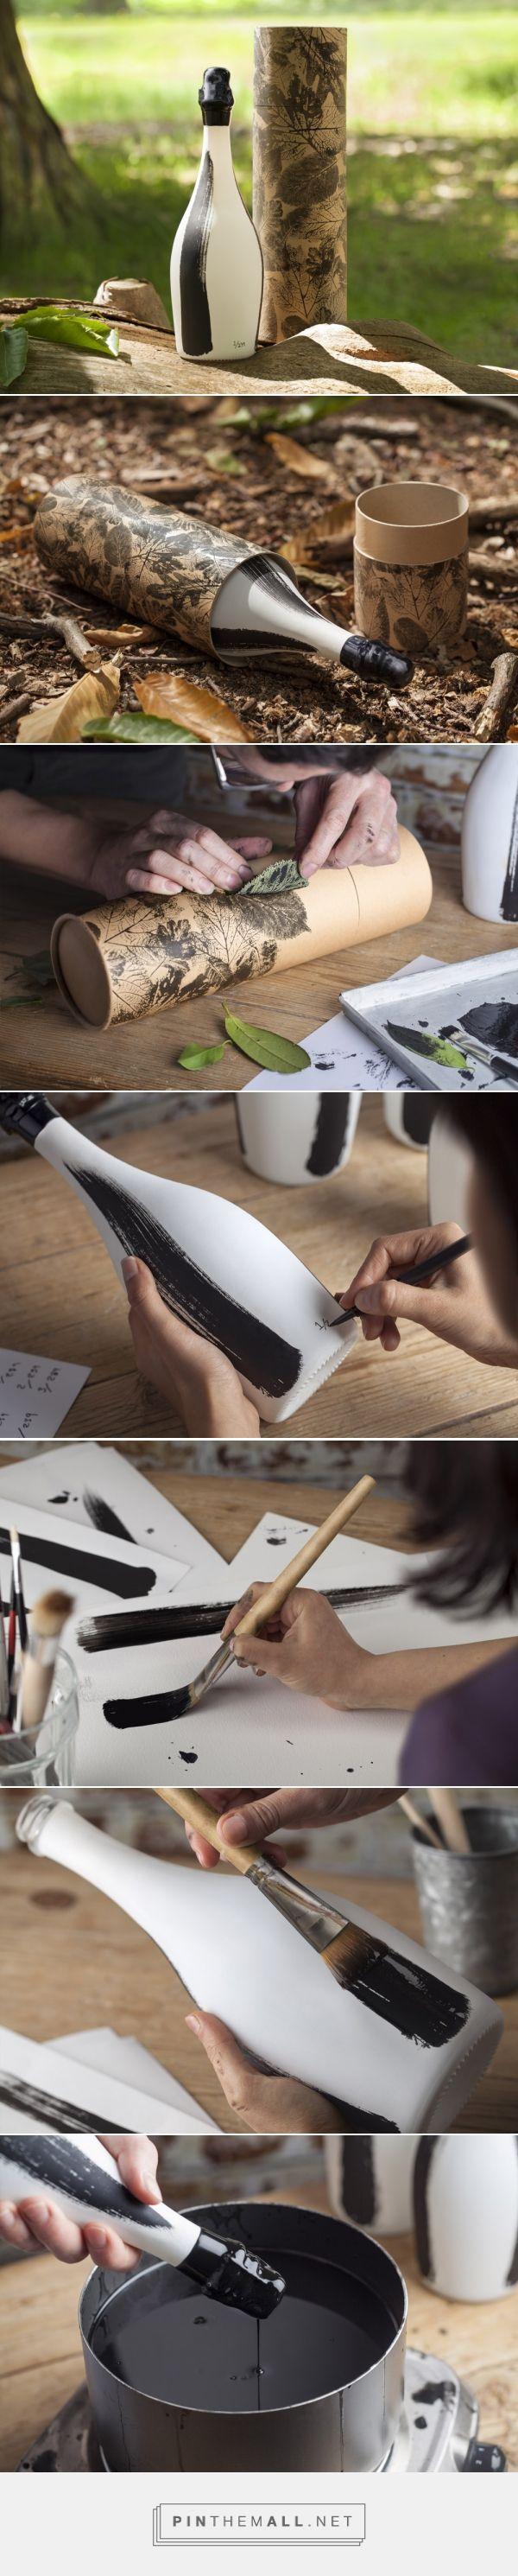 The Badger Collector's Edition packaging design by BrandOpus - http://www.packagingoftheworld.com/2017/05/the-badger.html Empaque tubular pintado con hojas reales